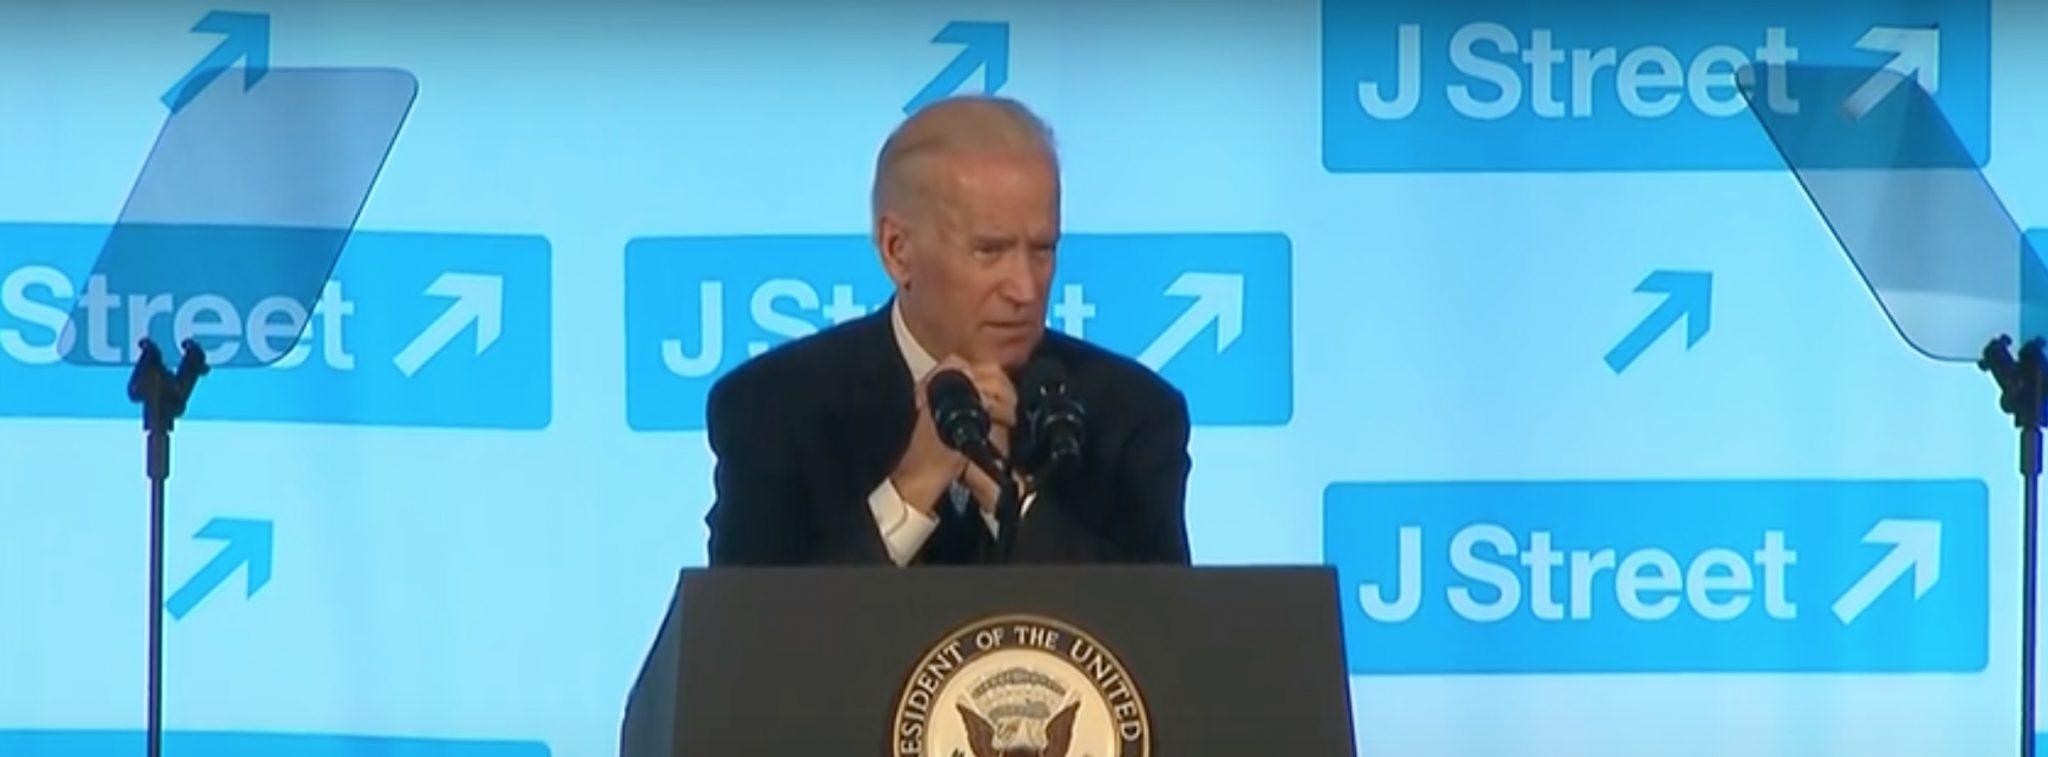 Biden's Hostility to Israel | The American Spectator | USA News and PoliticsThe American Spectator | USA News and Politics